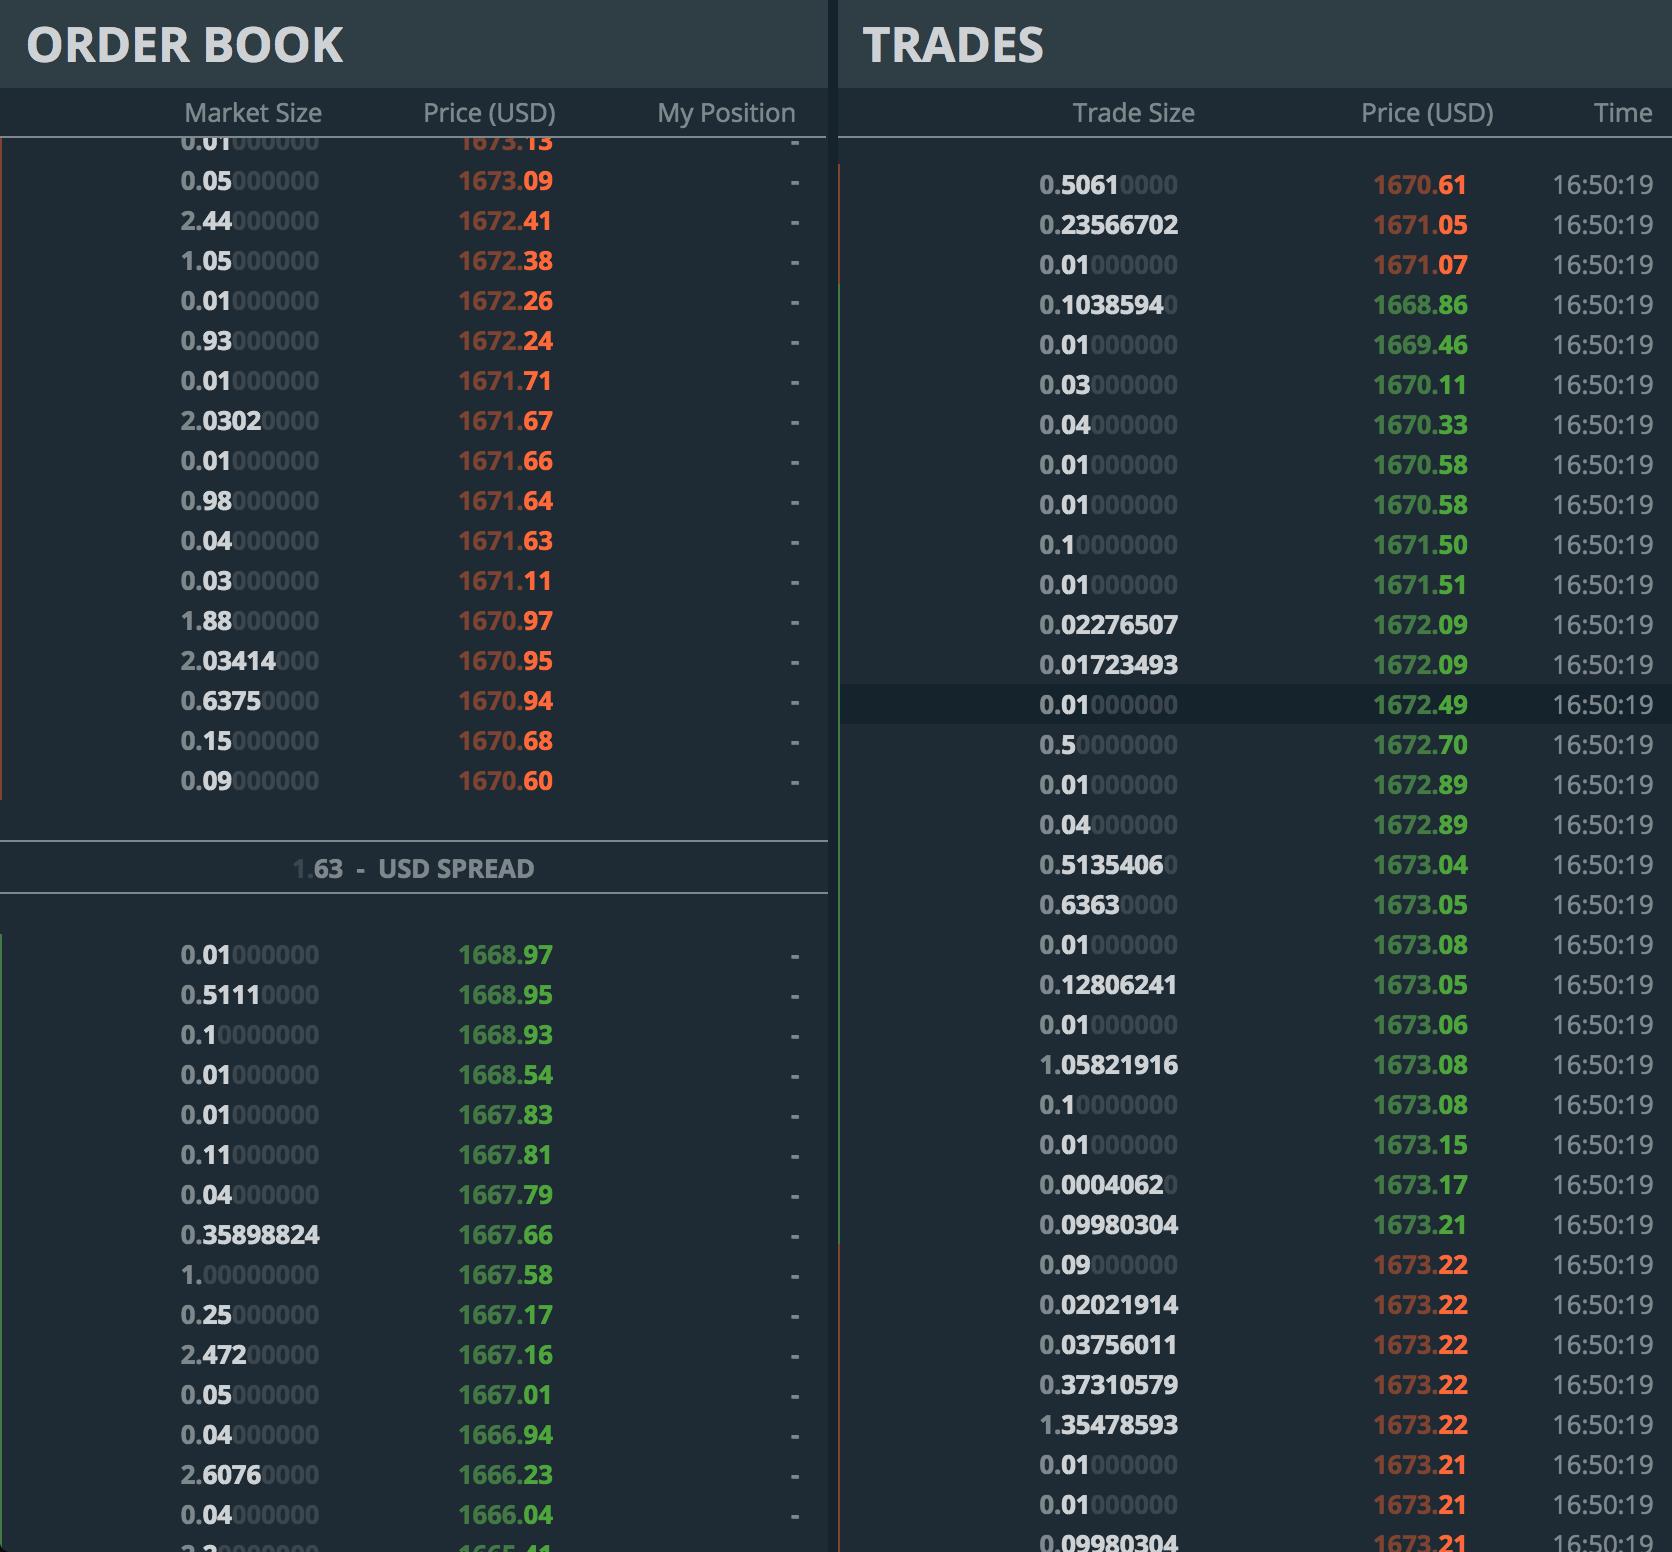 react-trading-ui